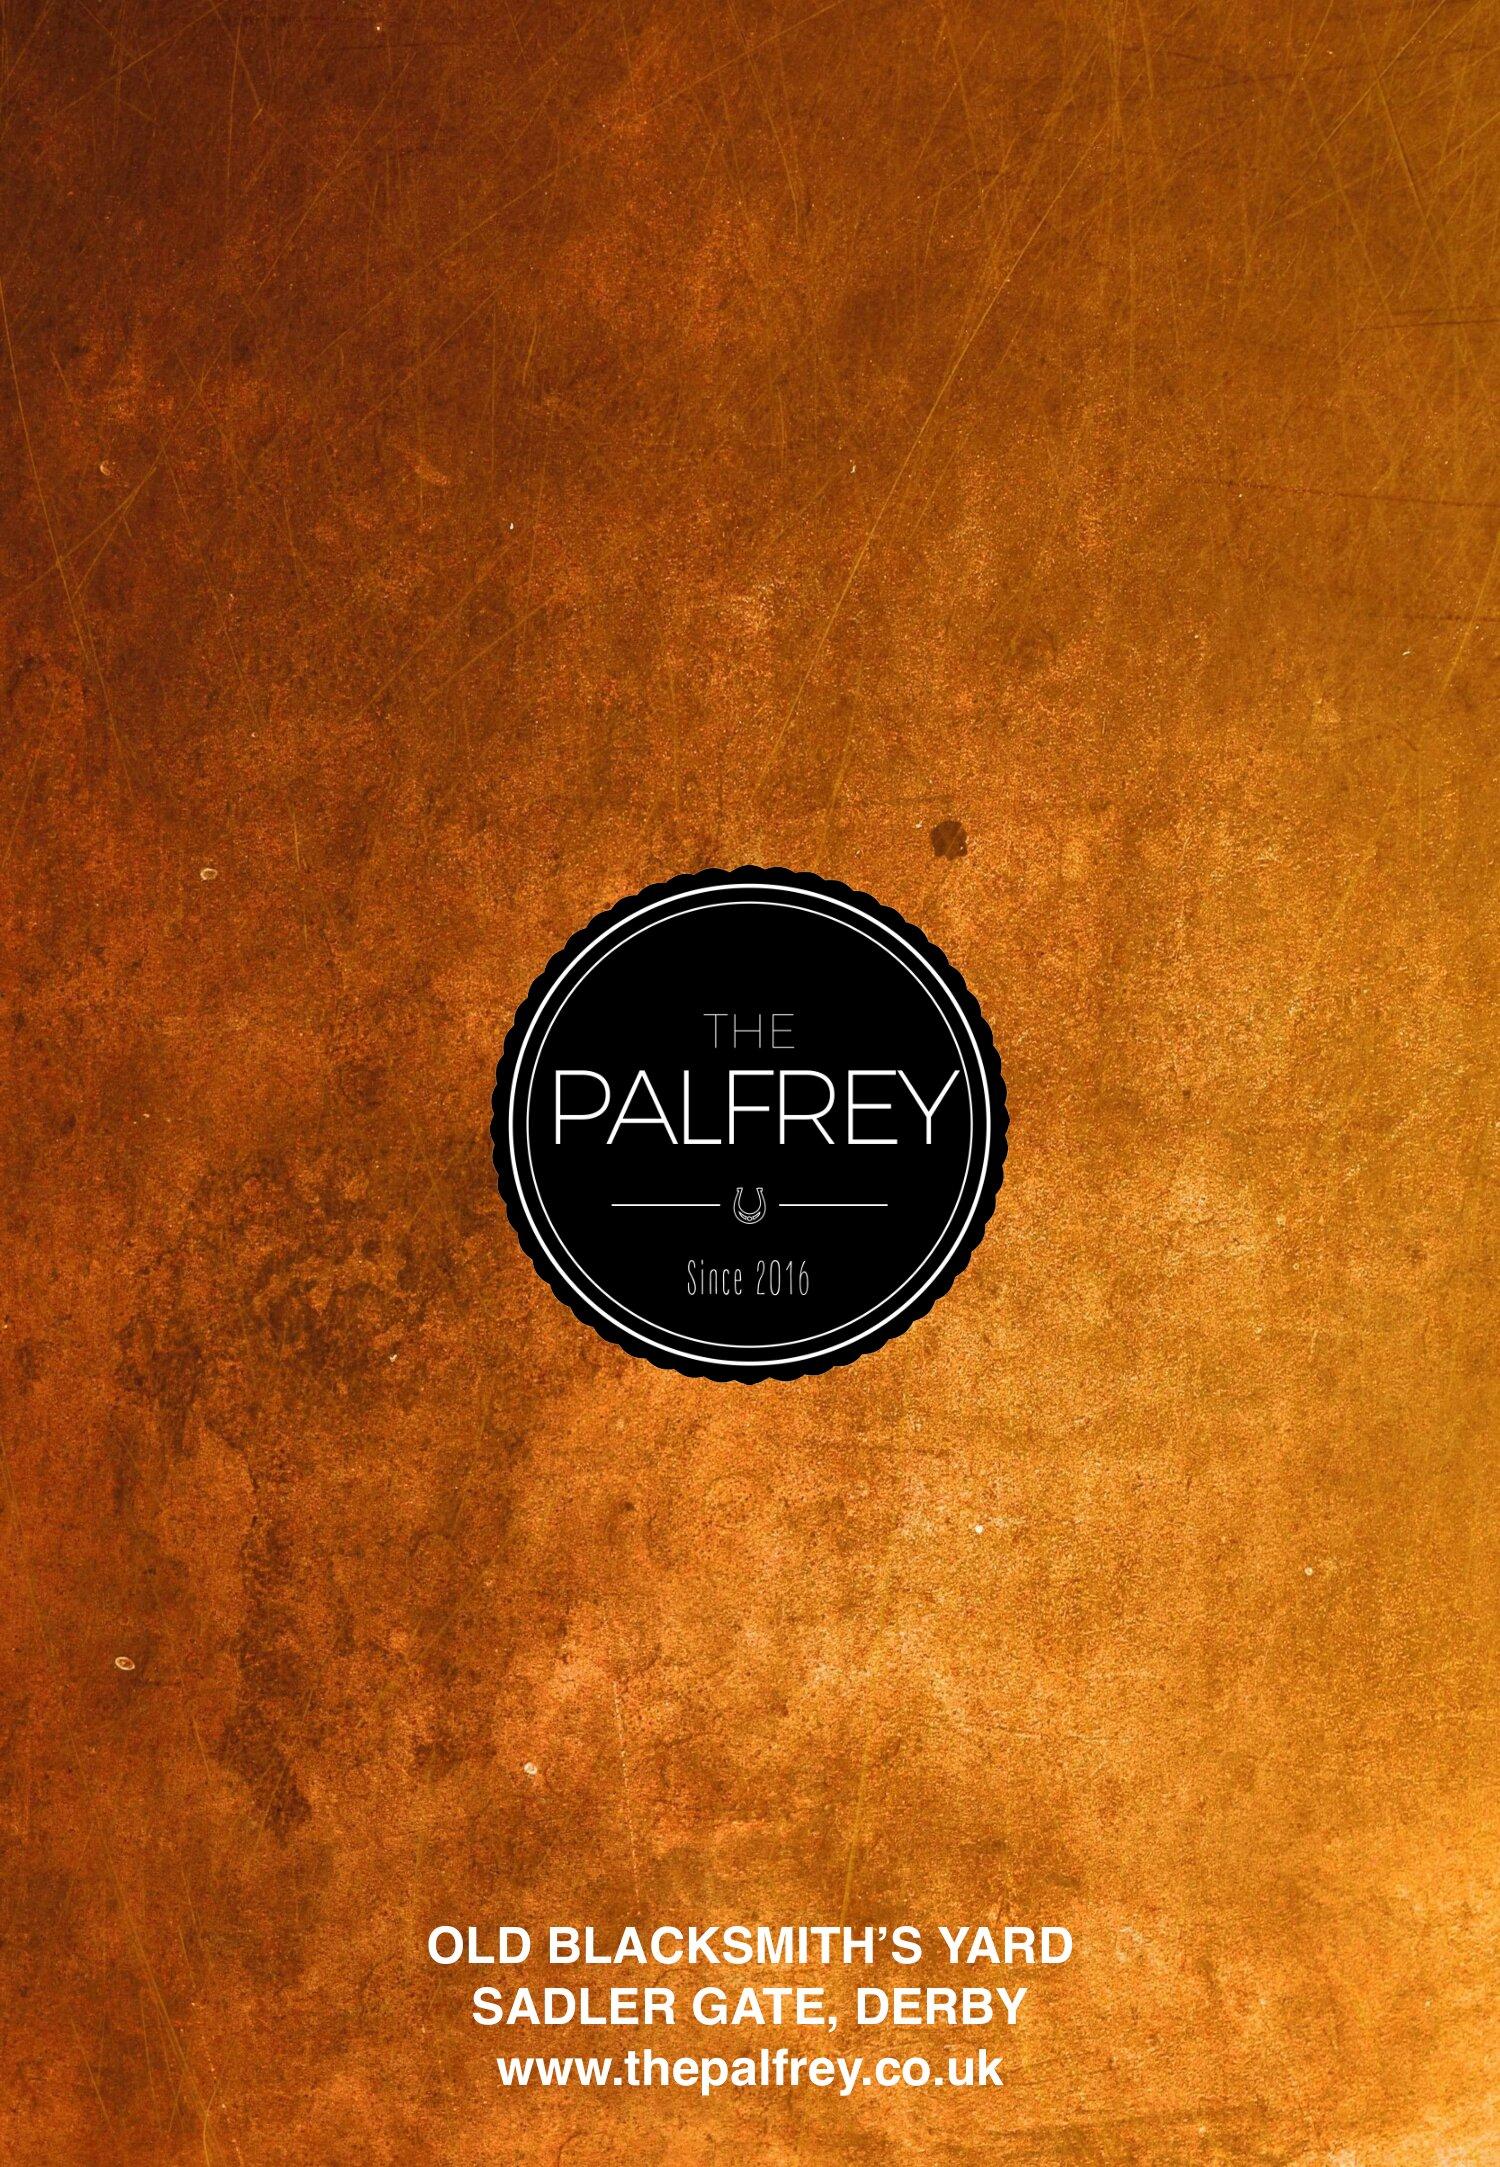 Palfrey Casual Dining Menu - August 2020_2-end